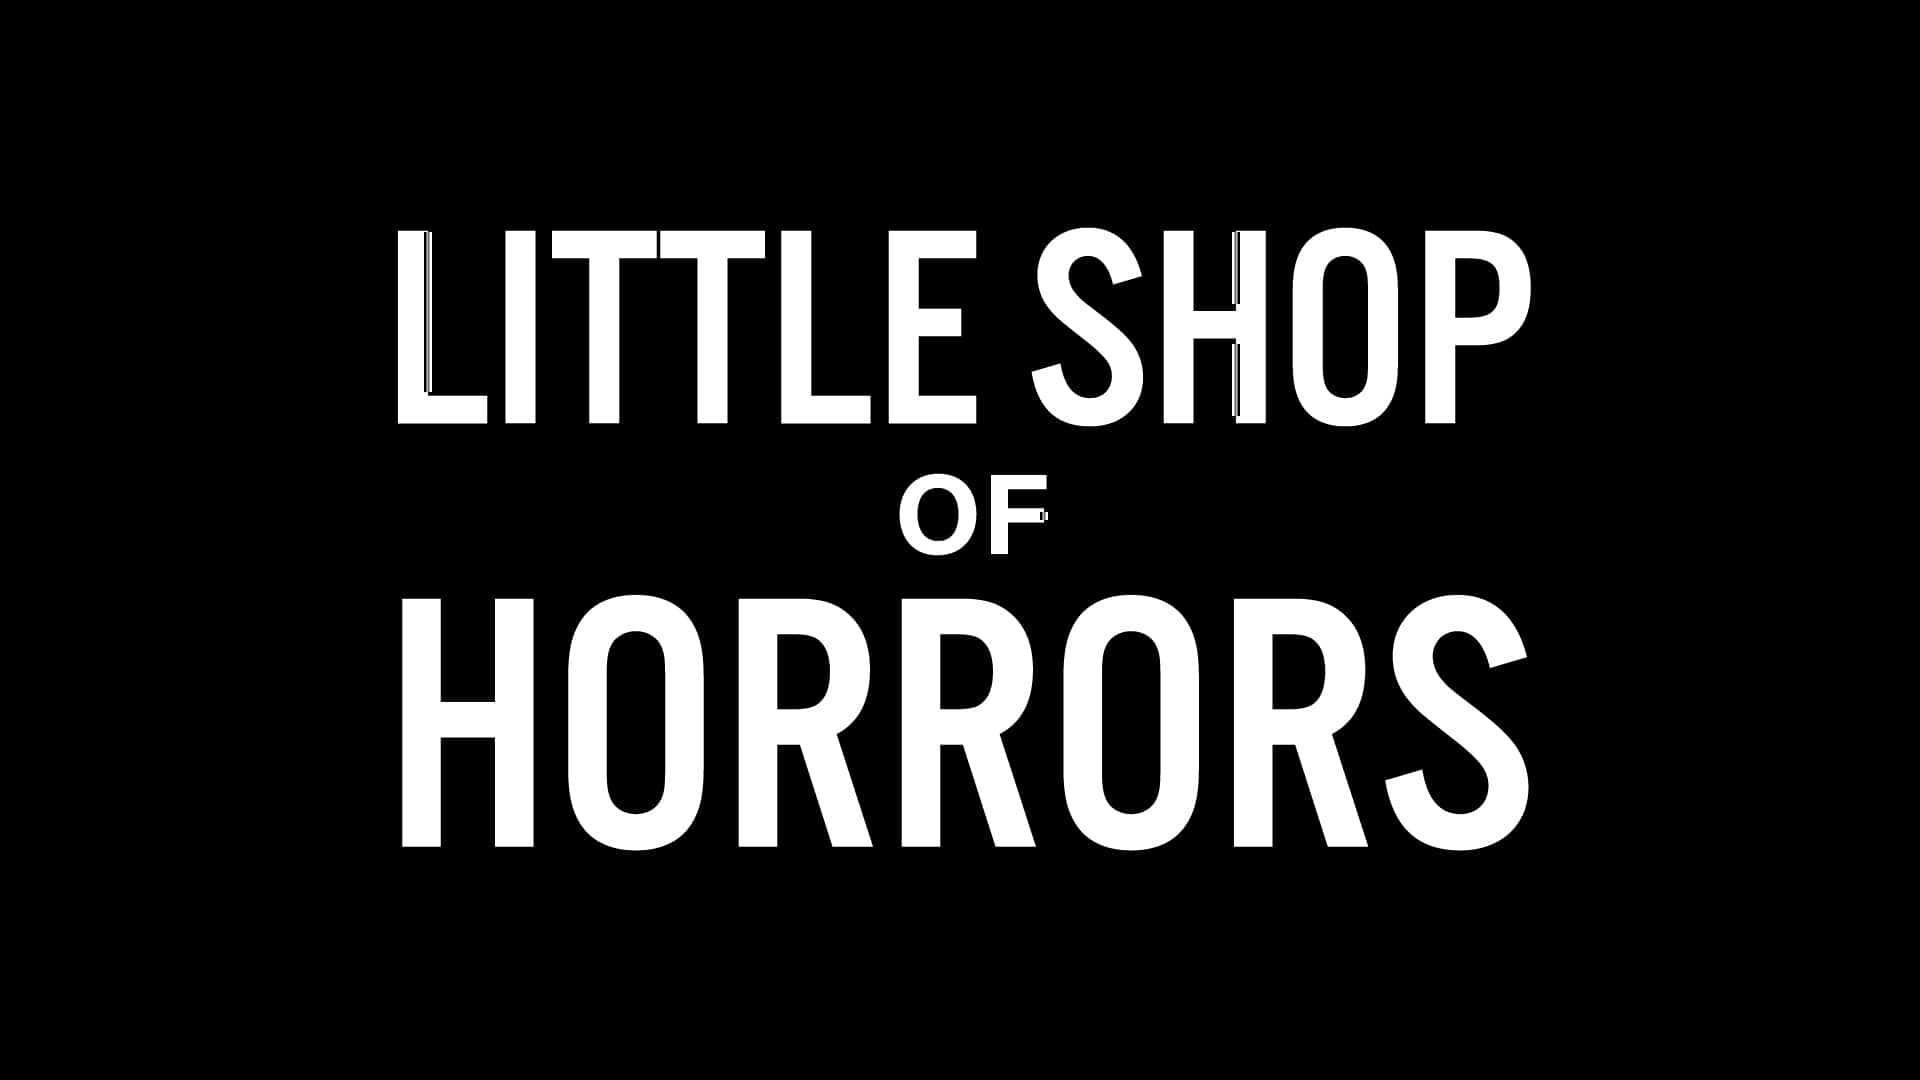 LITTLE SHOP OF HORRORS — MAR. 3–APR. 3, 2022